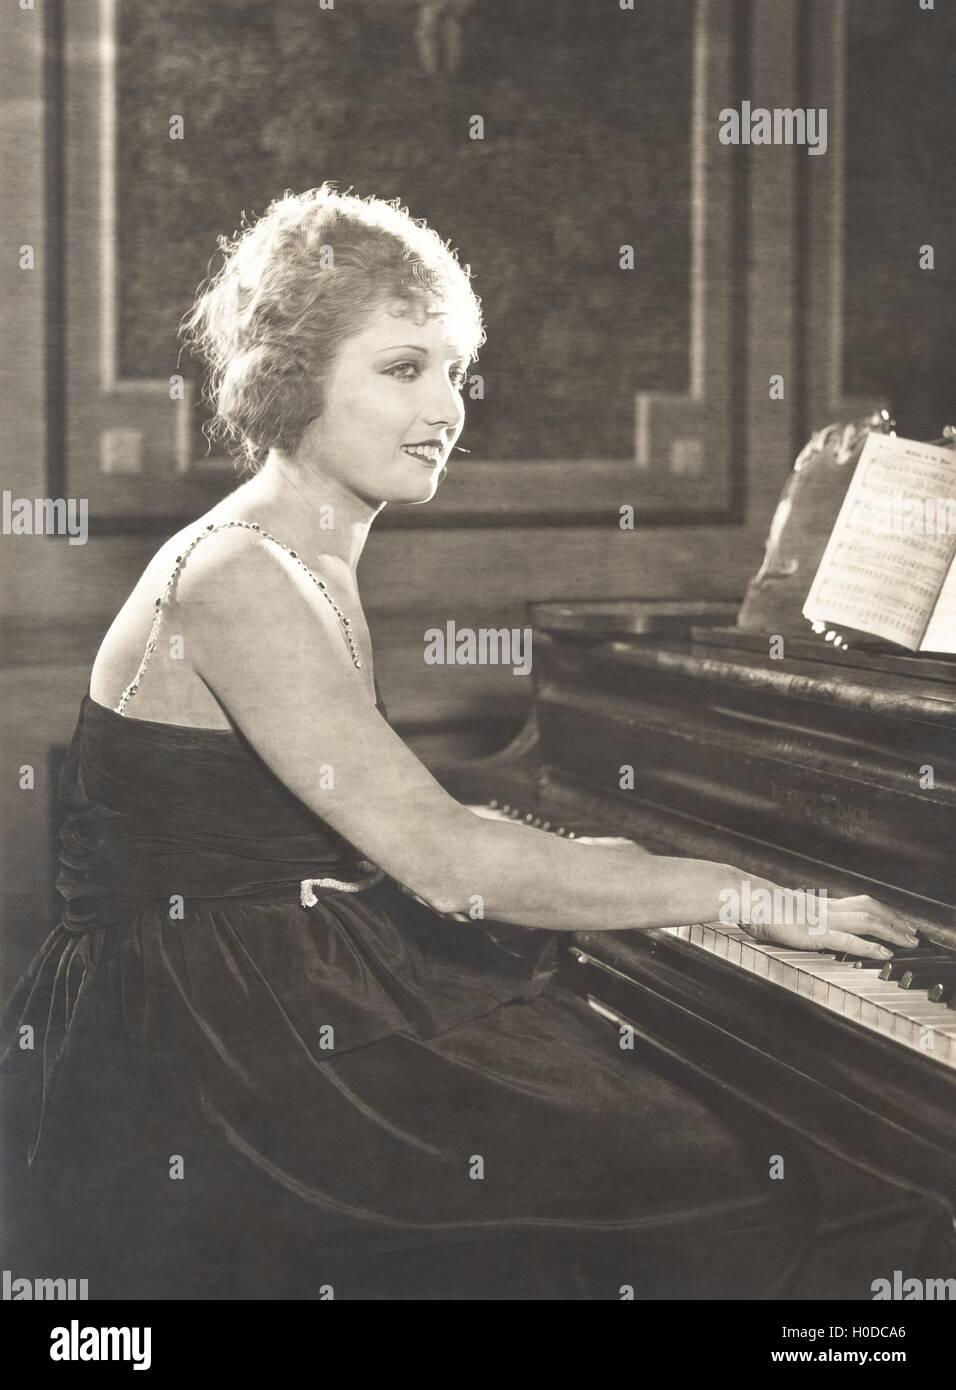 Woman playing piano - Stock Image